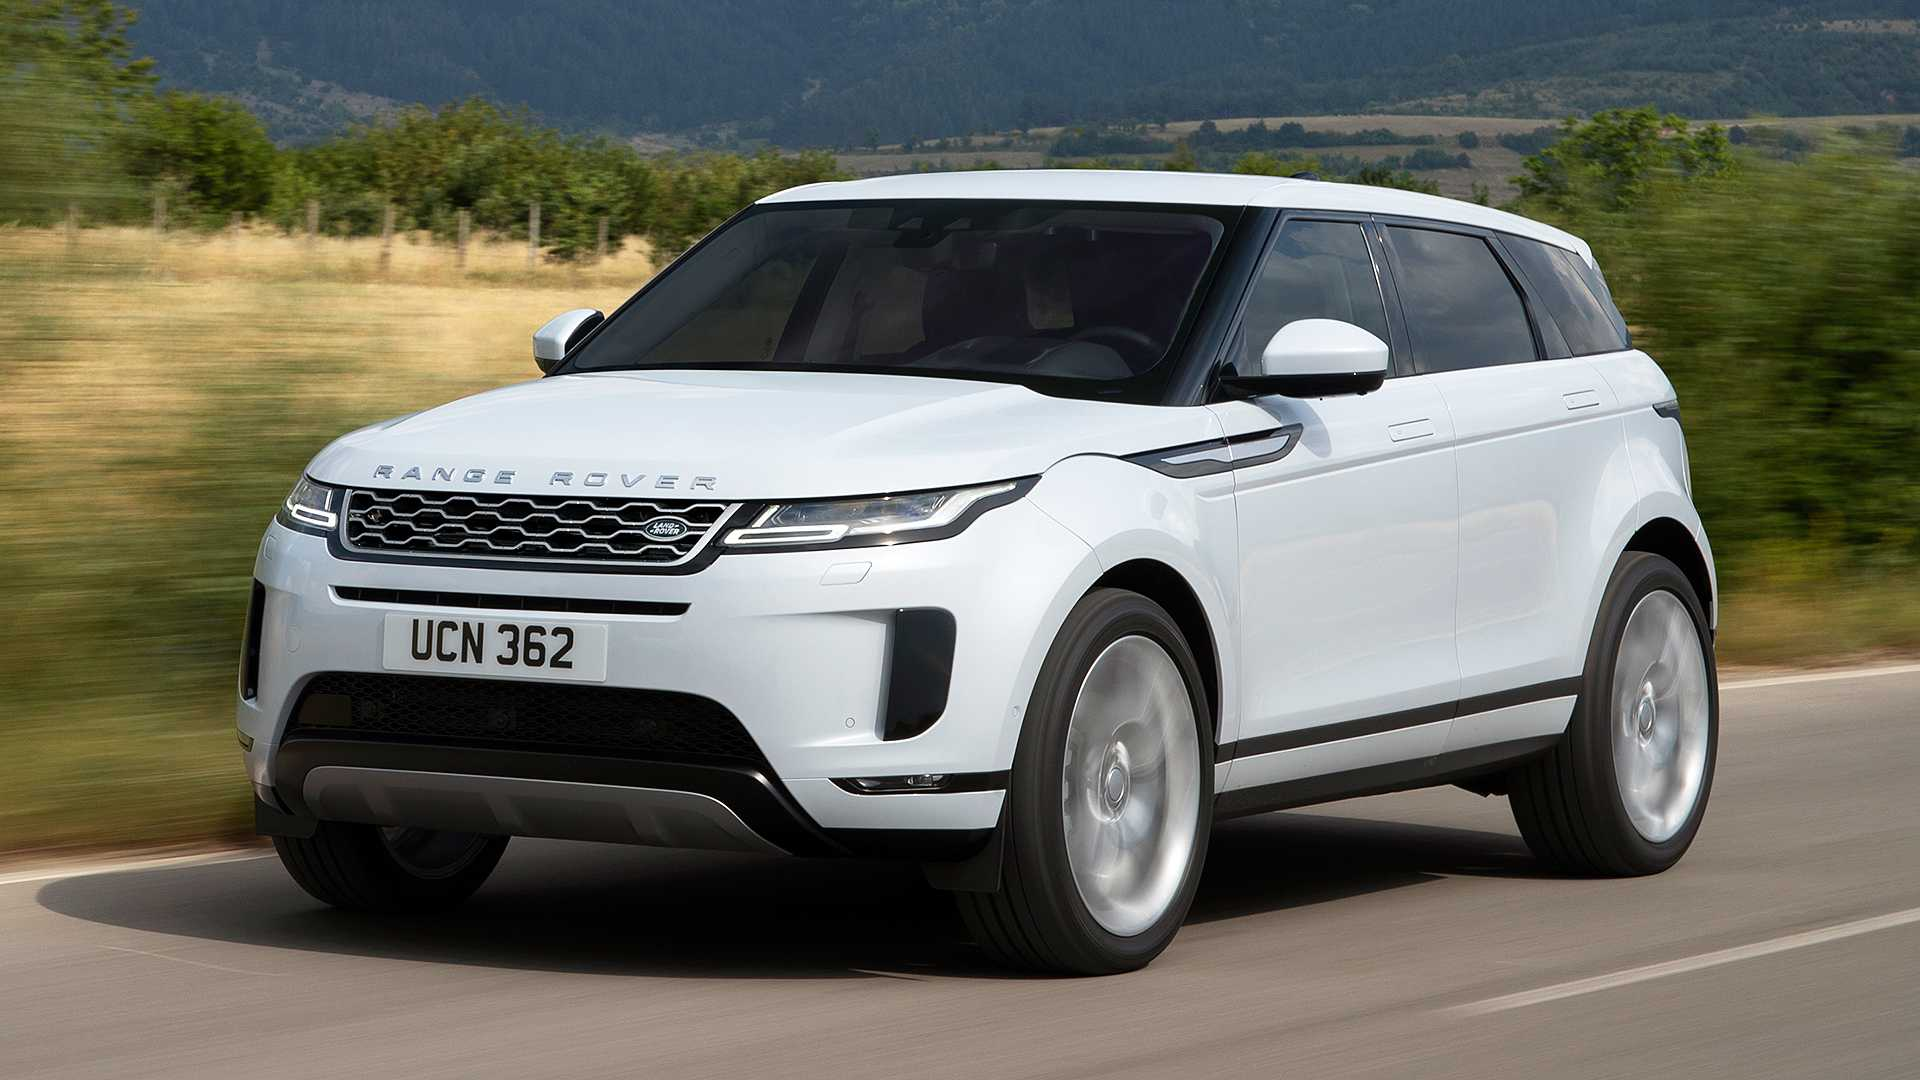 2020-range-rover-evoque (5)